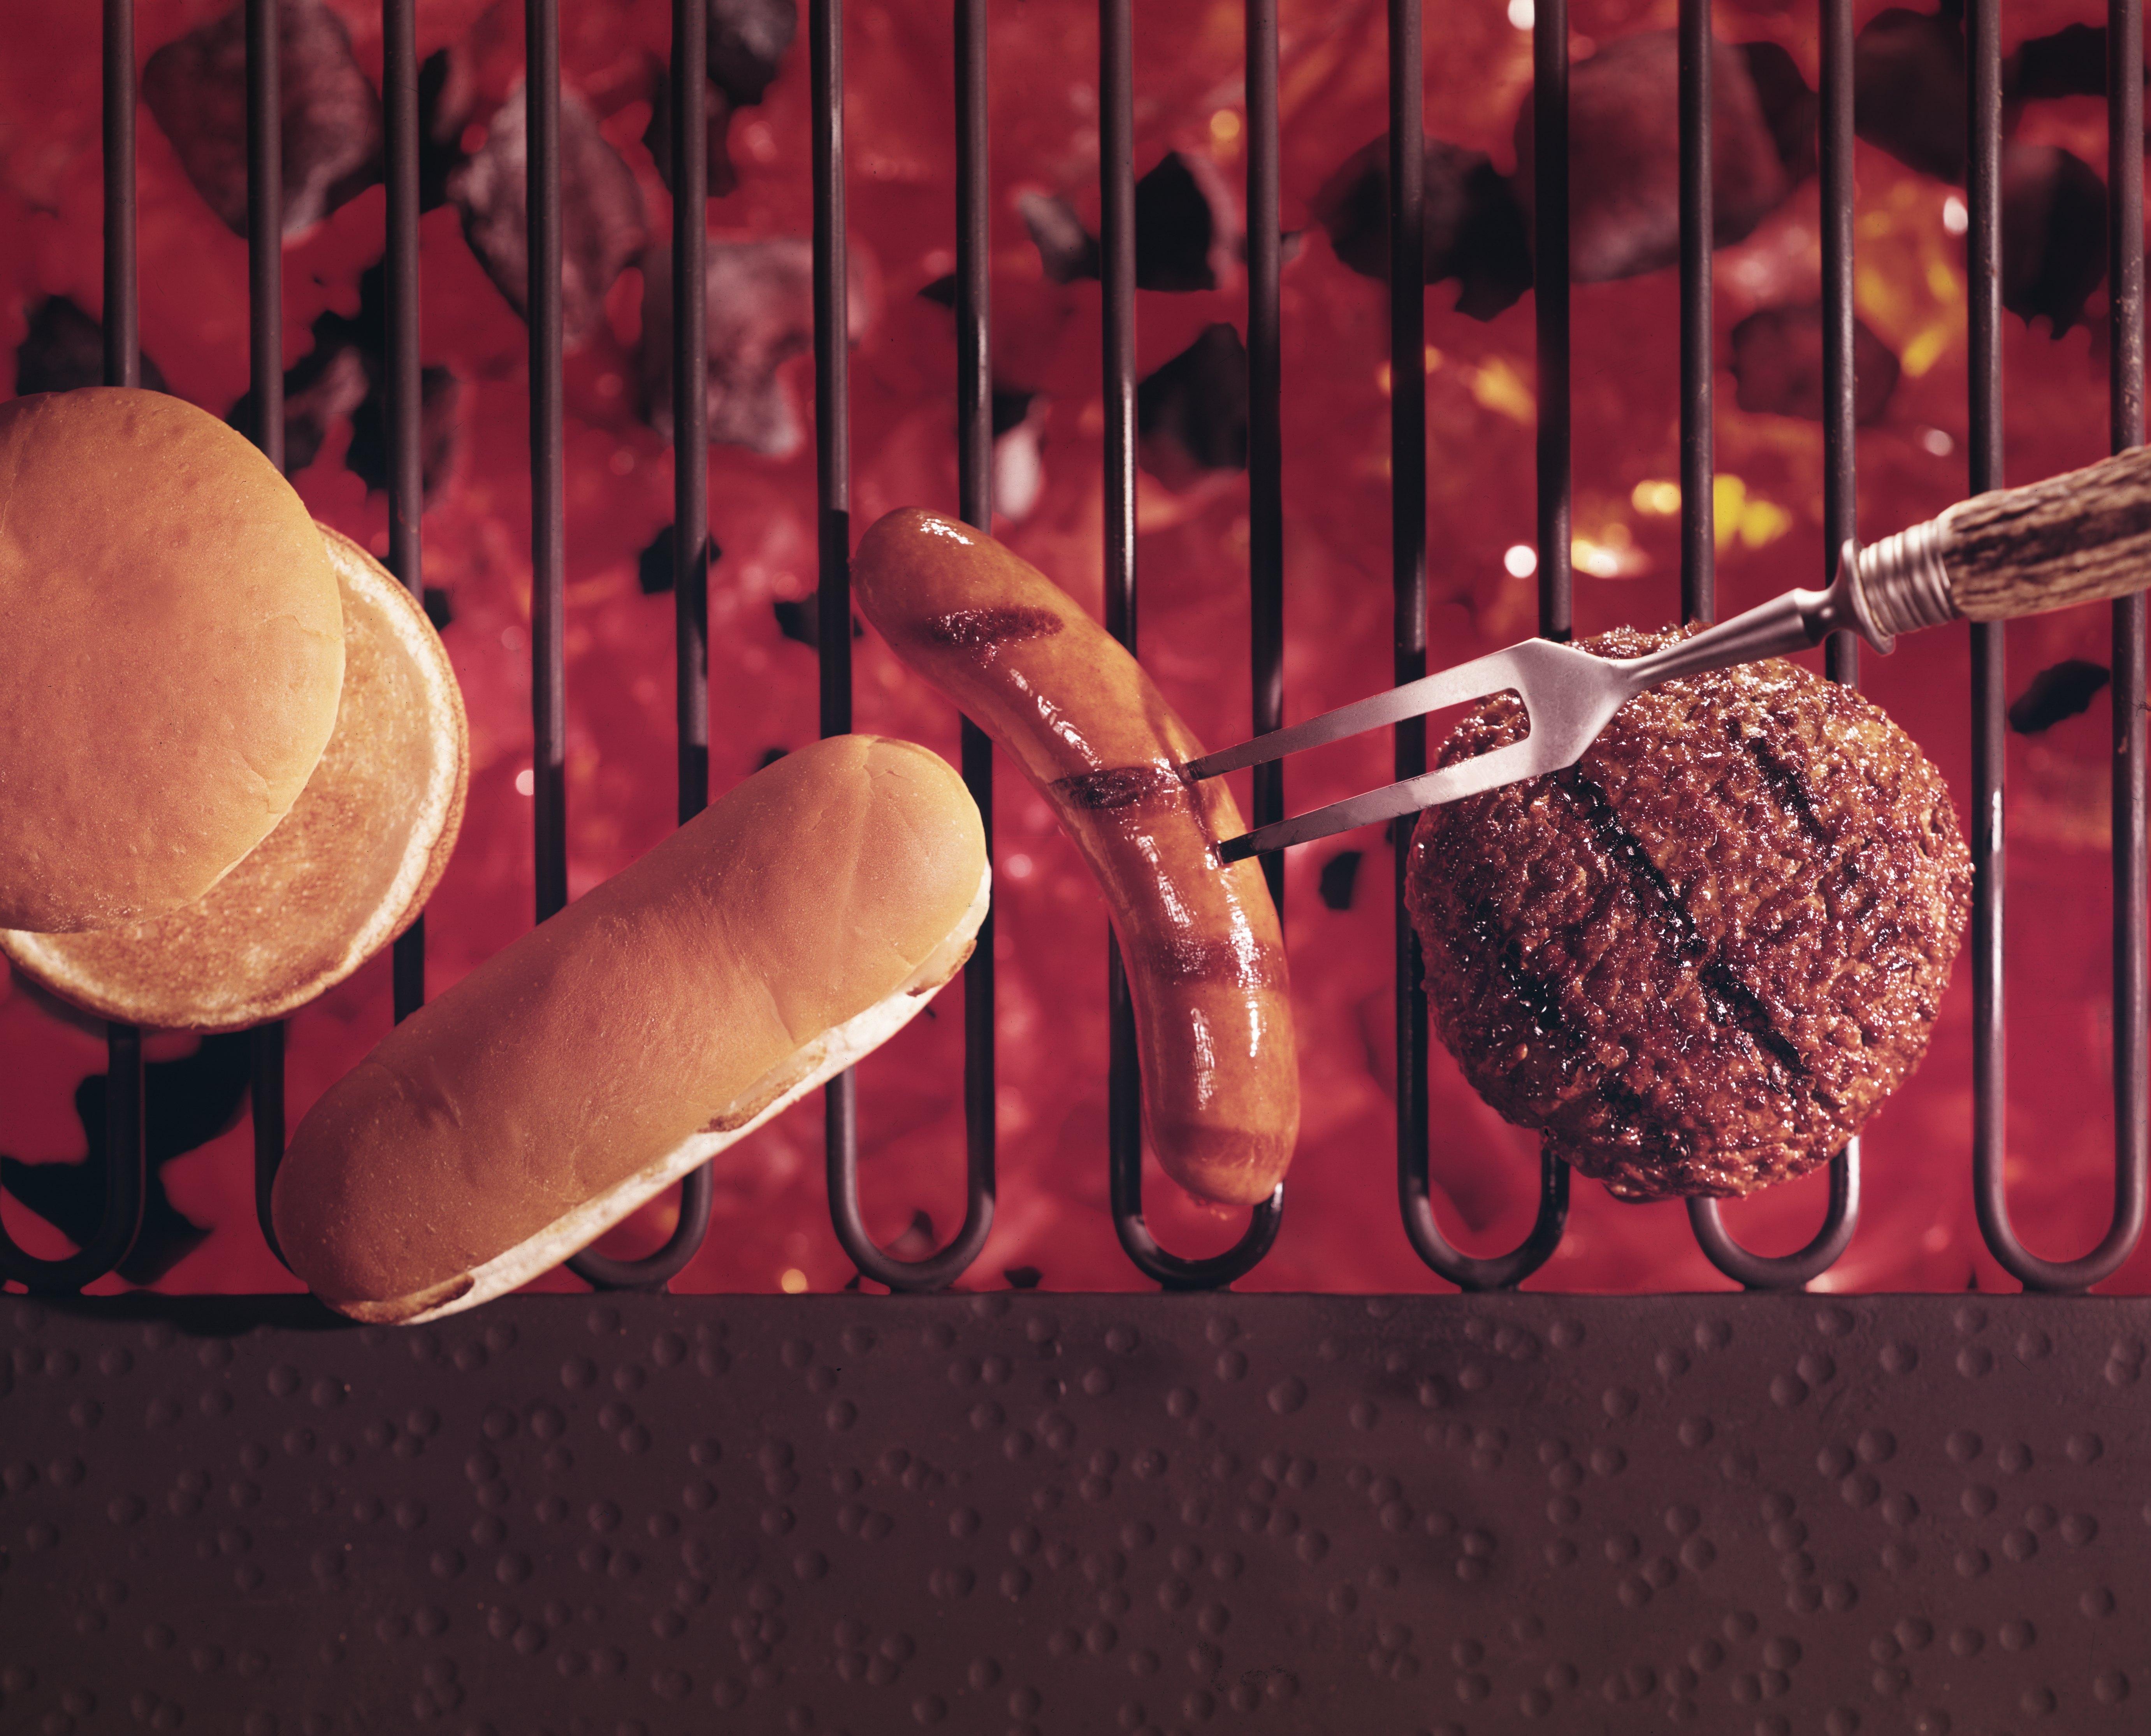 95922223-hamburger-and-hot-dog-on-the-grill.jpg